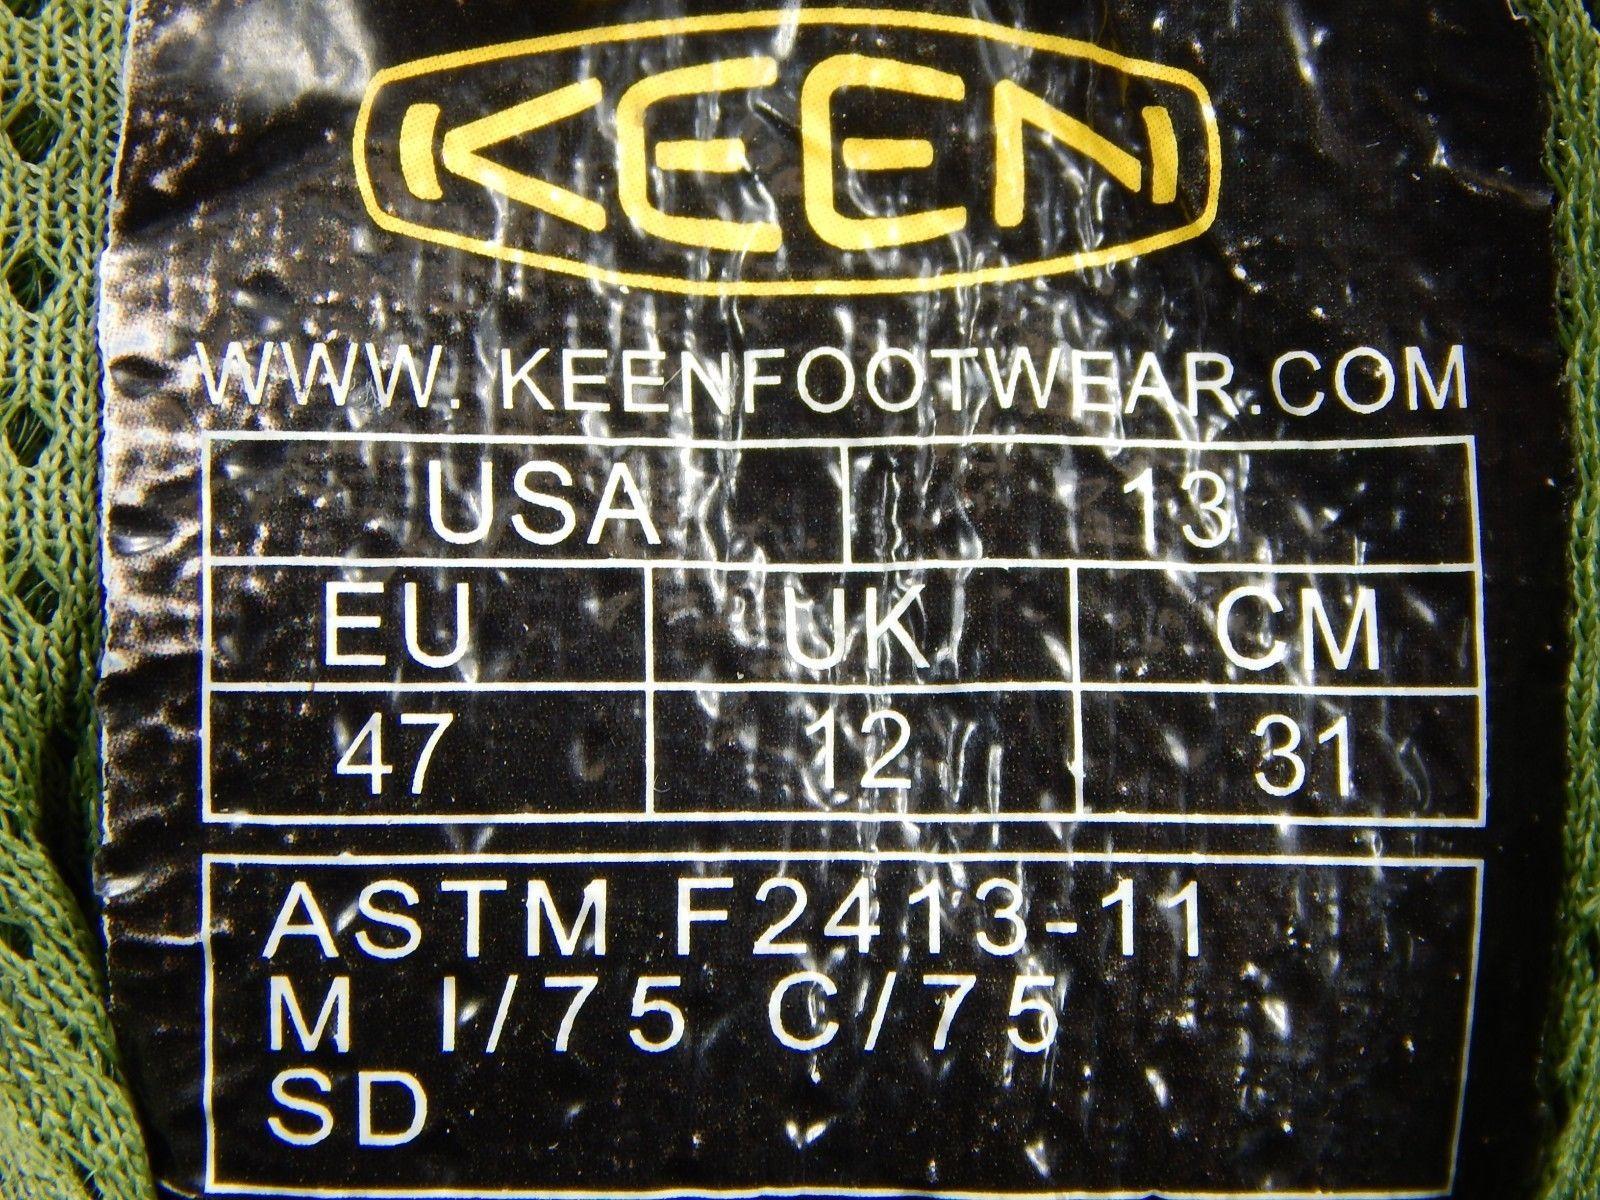 Keen Durham ESD Size 13 M EU 47 Aluminum Toe Slip Resist Men's Work Shoes